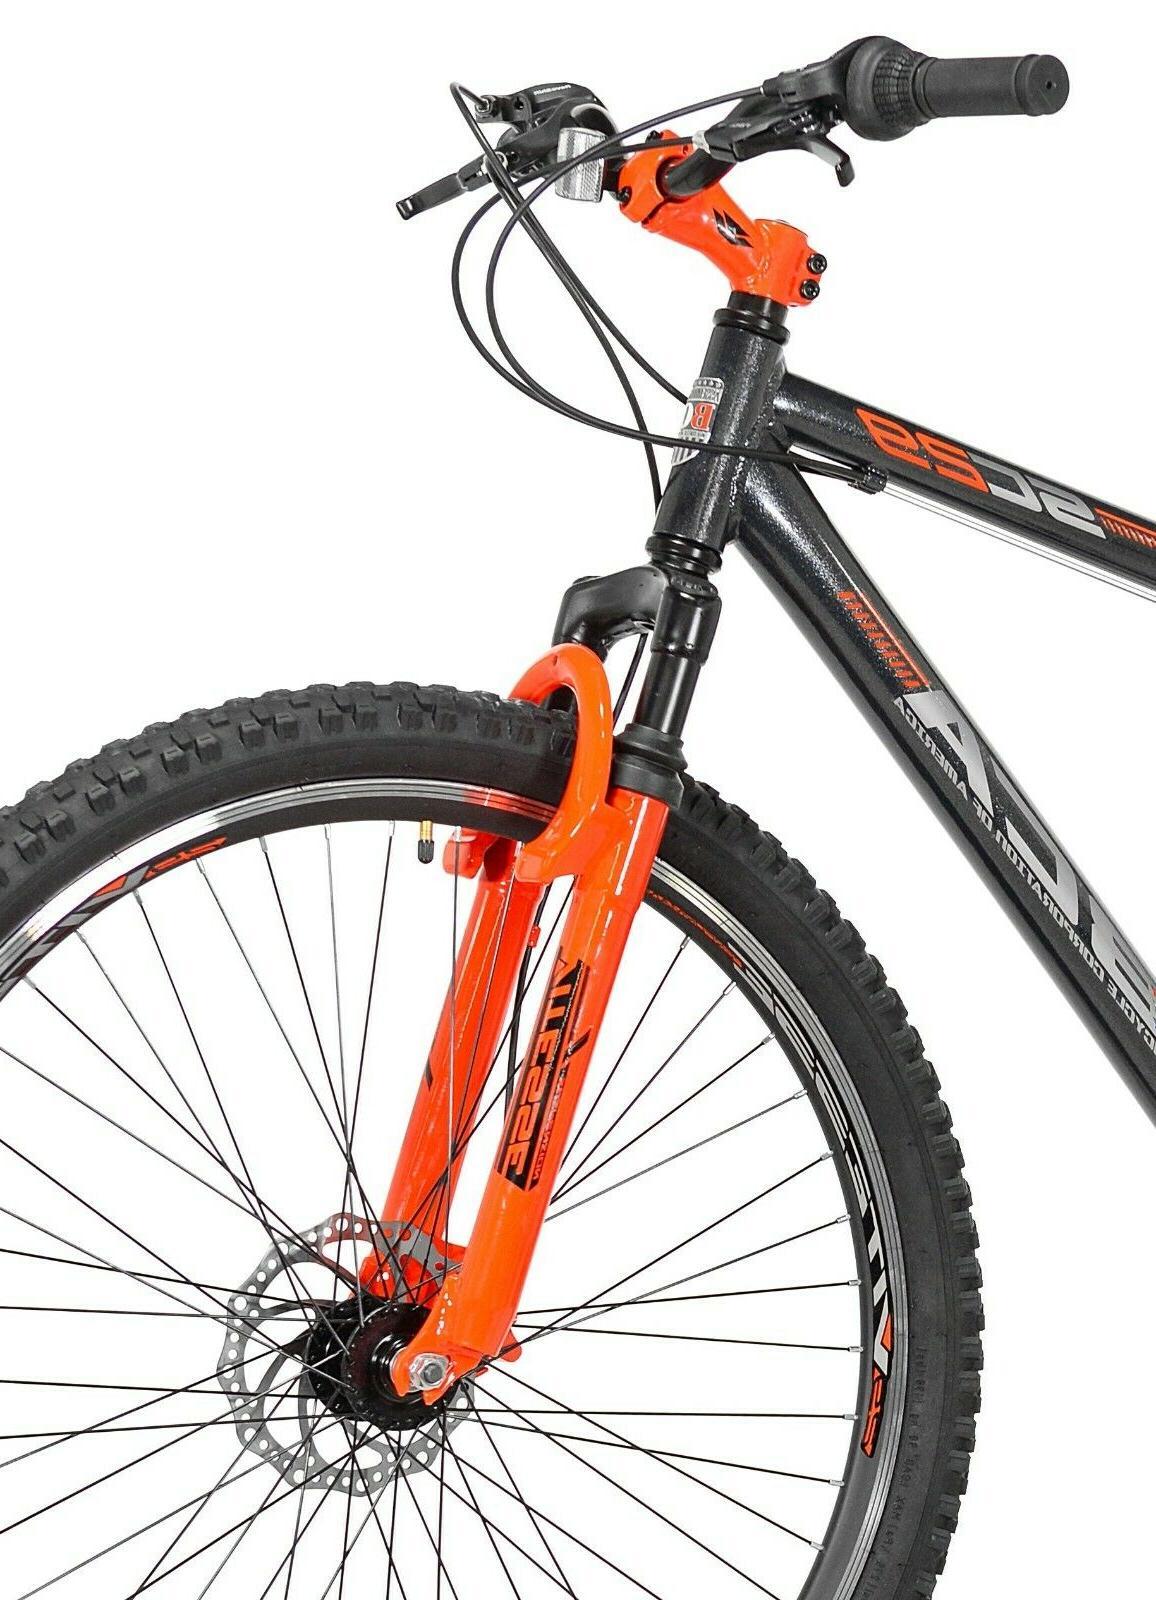 29-Inch Wheel 21-Speed Mountain Bike Bicycle